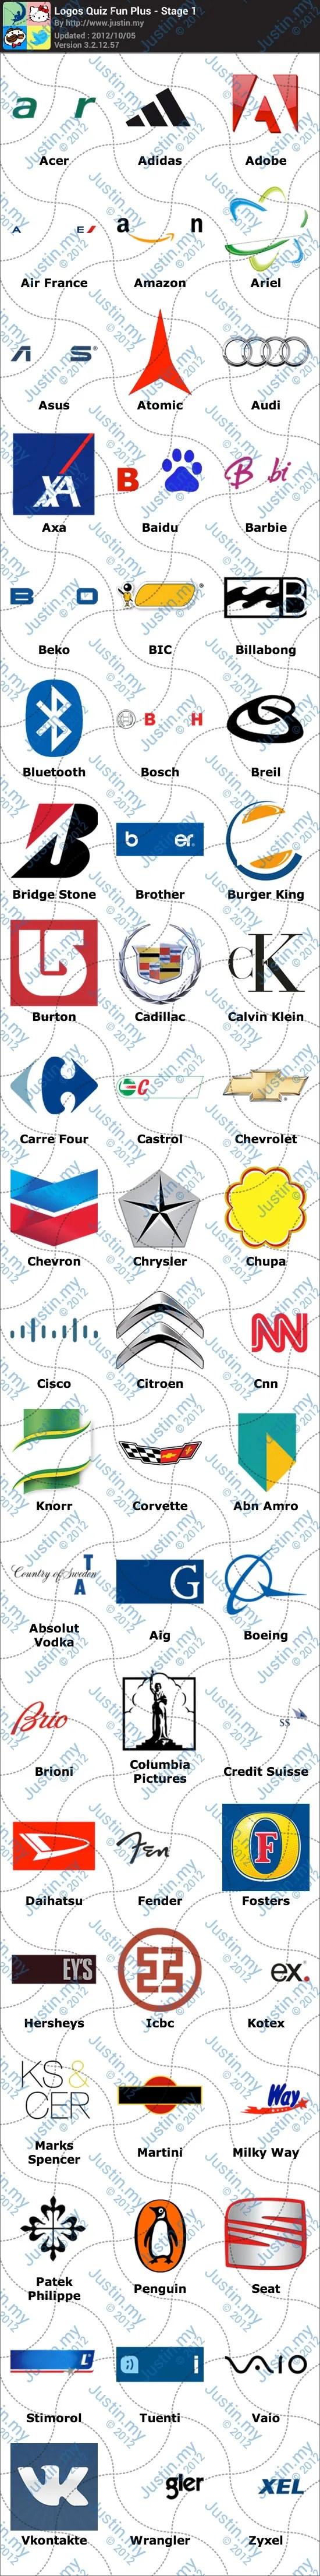 Logos Quiz Fun Plus Stage 1